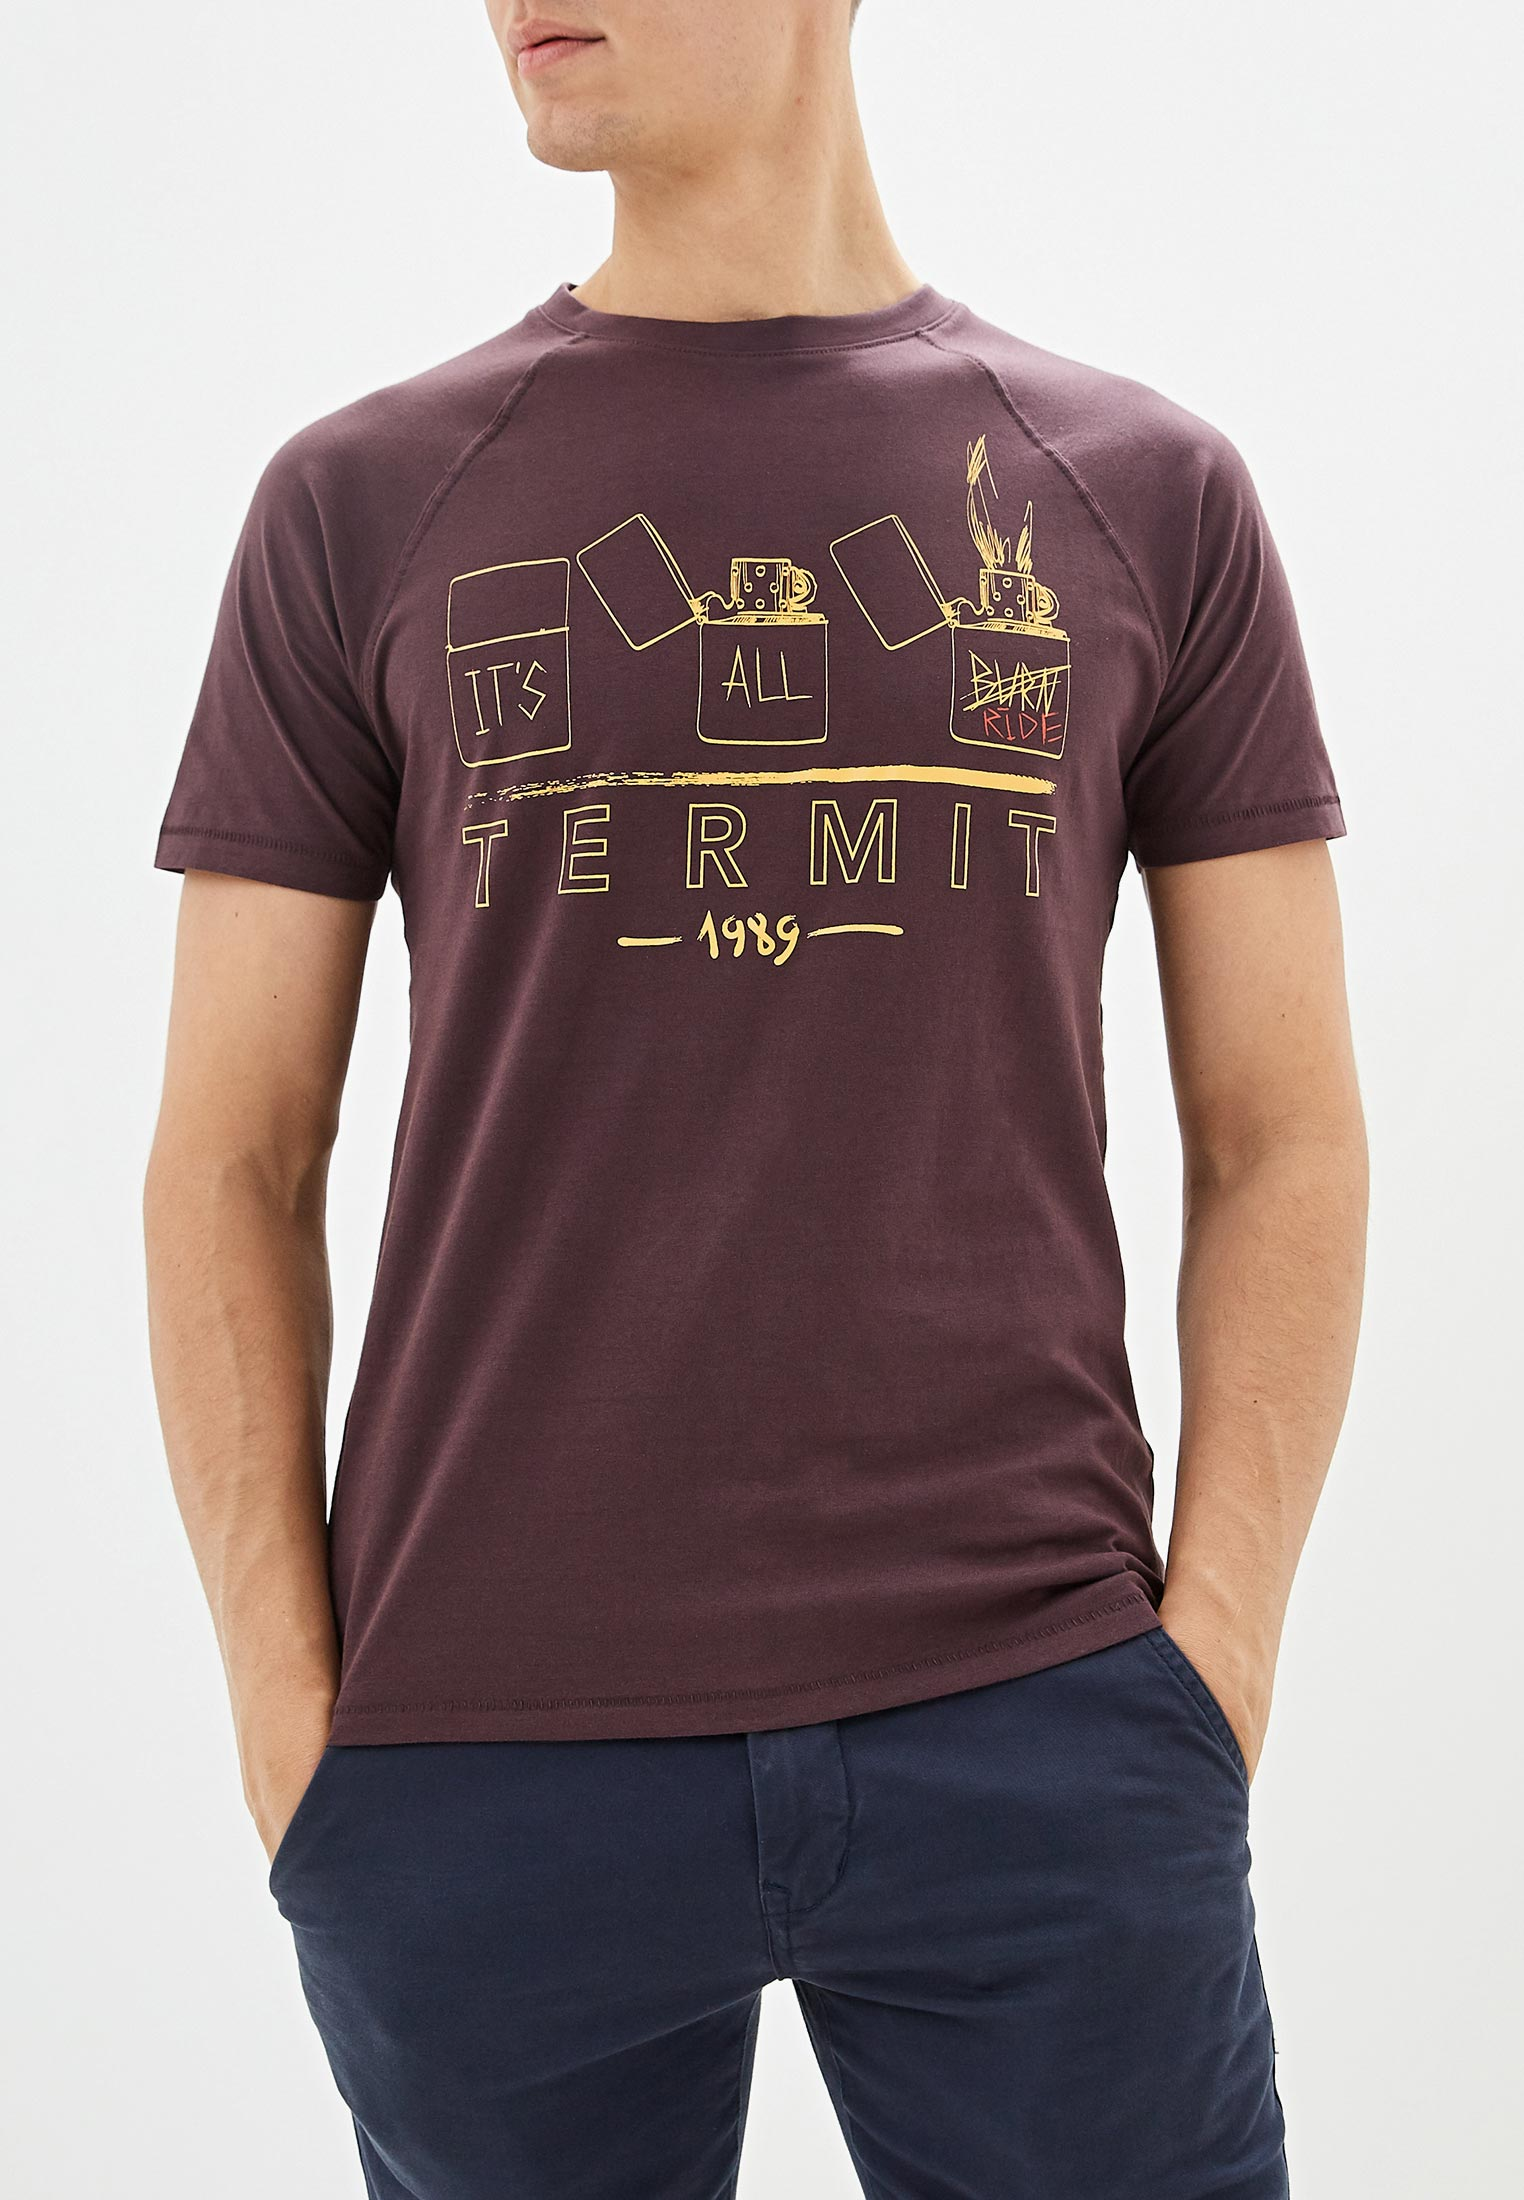 Спортивная футболка Termit 100823